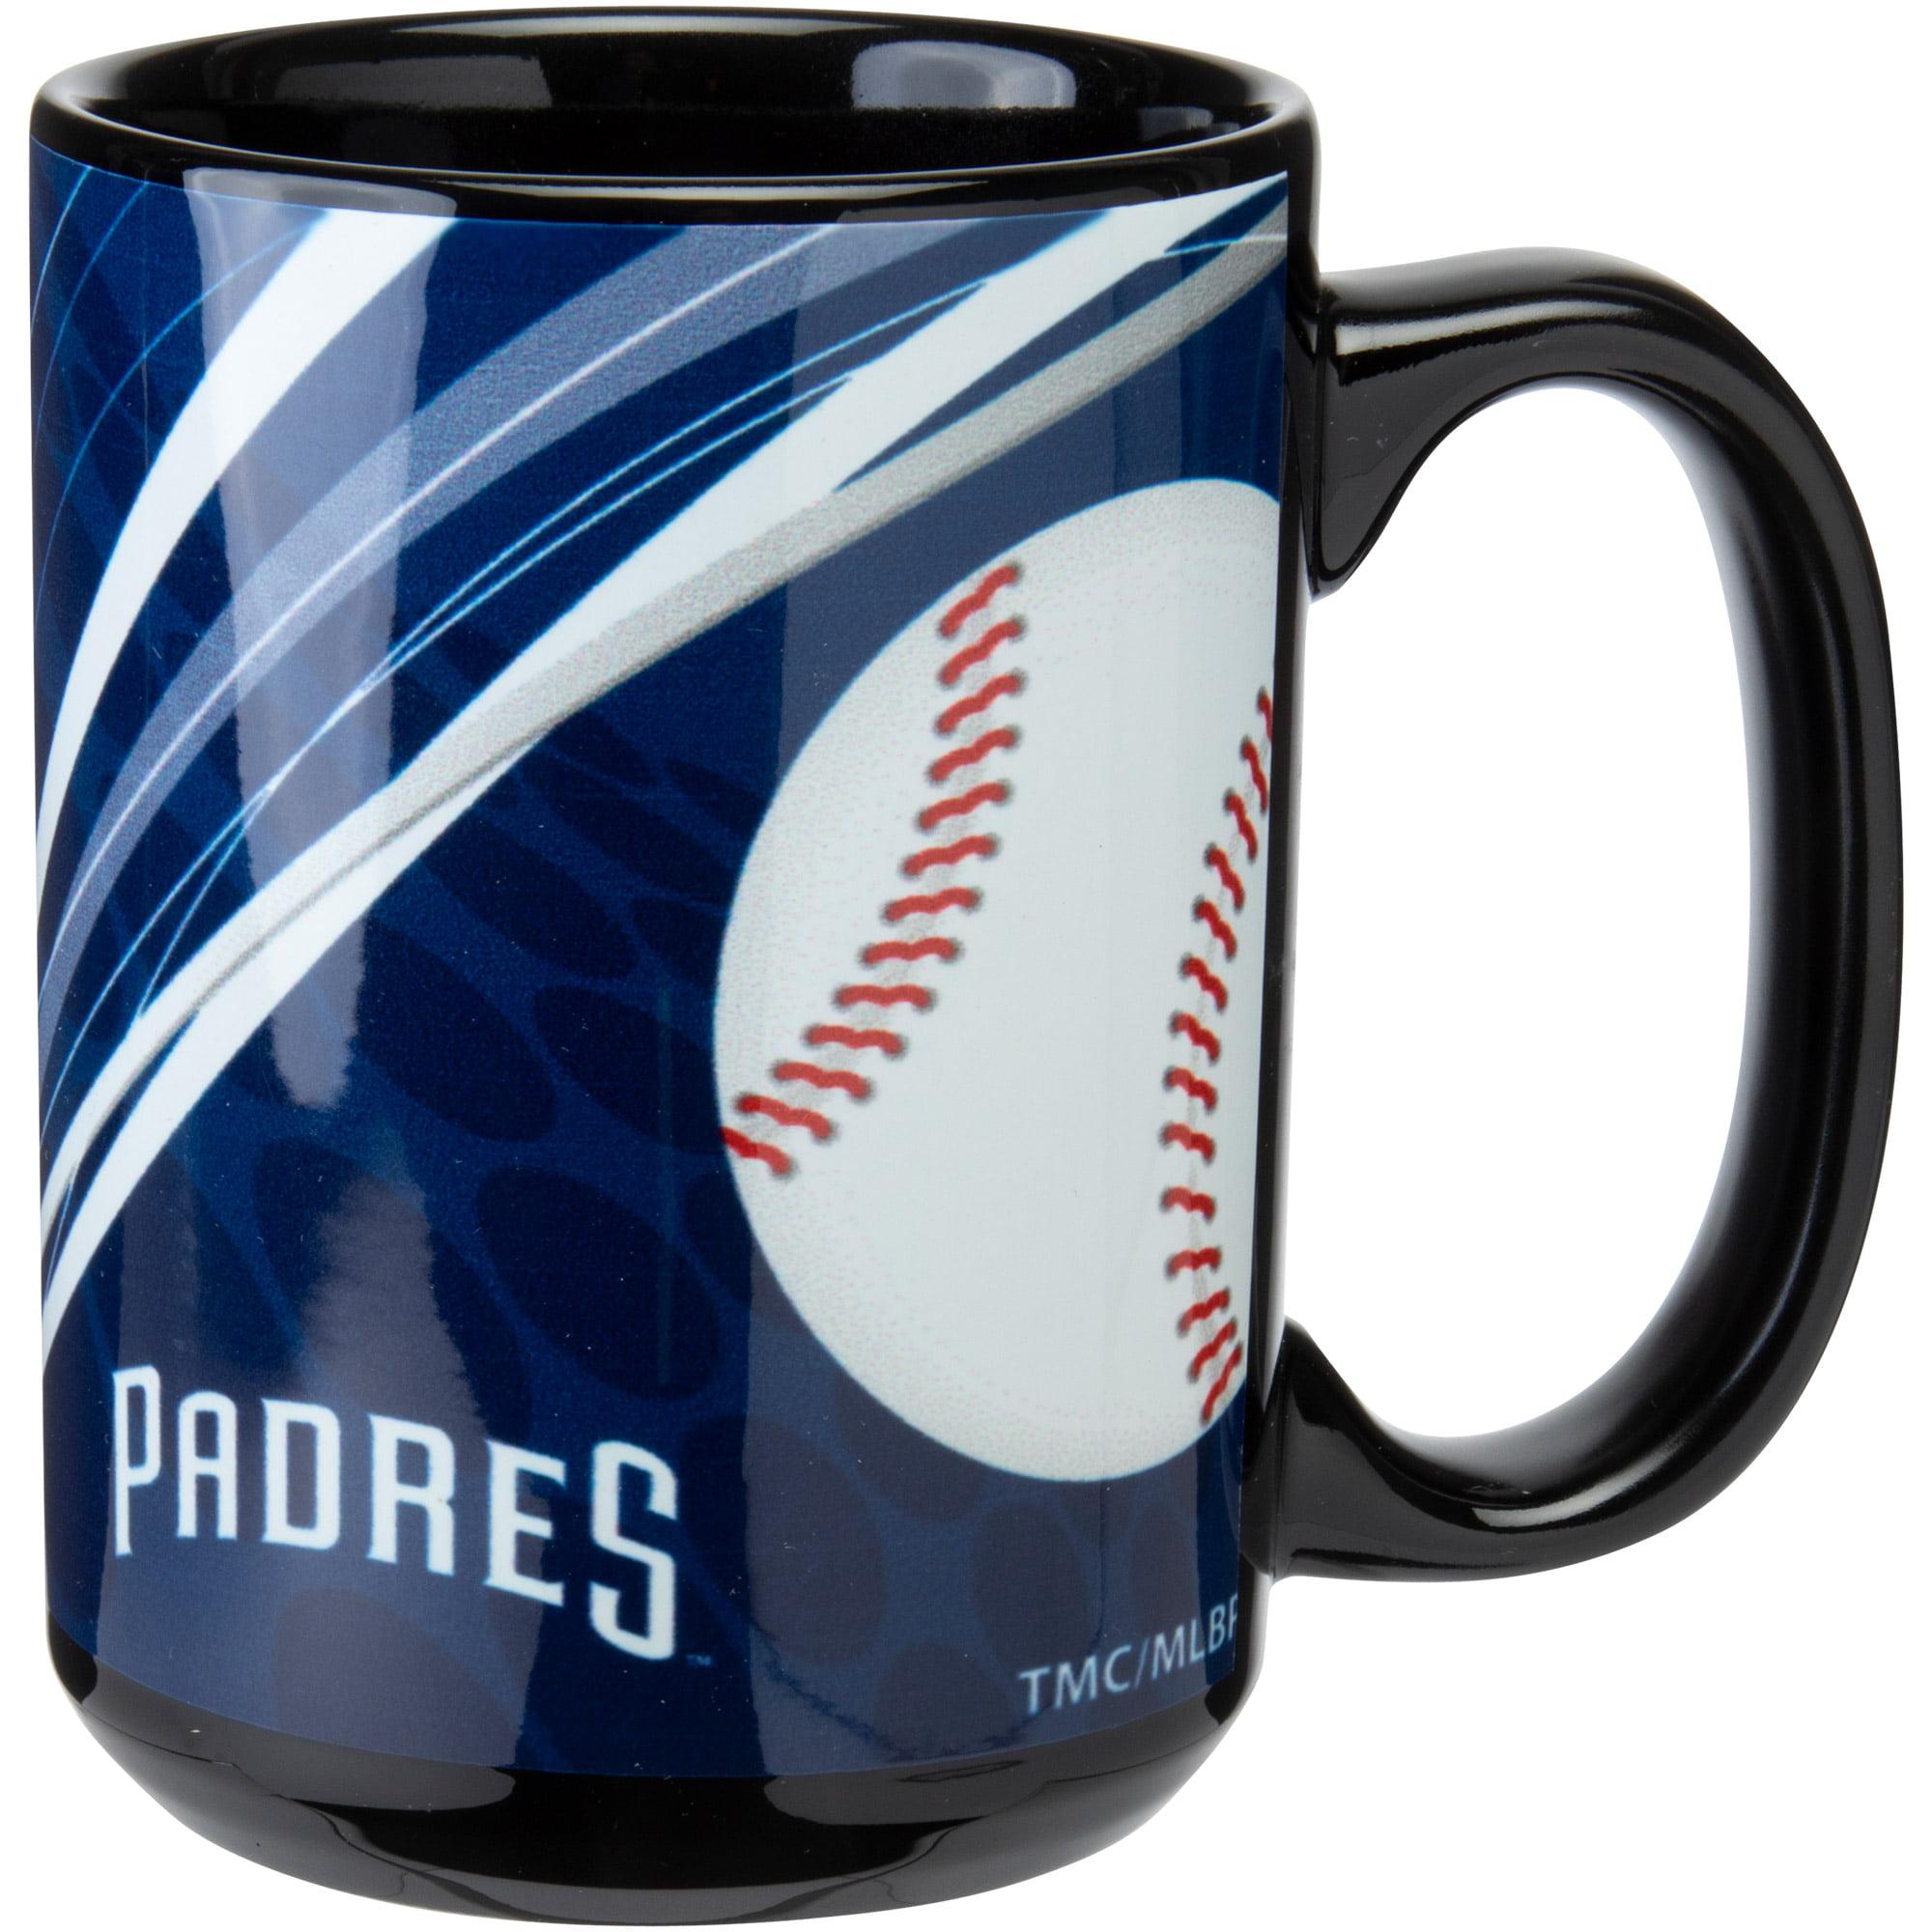 San Diego Padres 15oz. Dynamic Mug - No Size